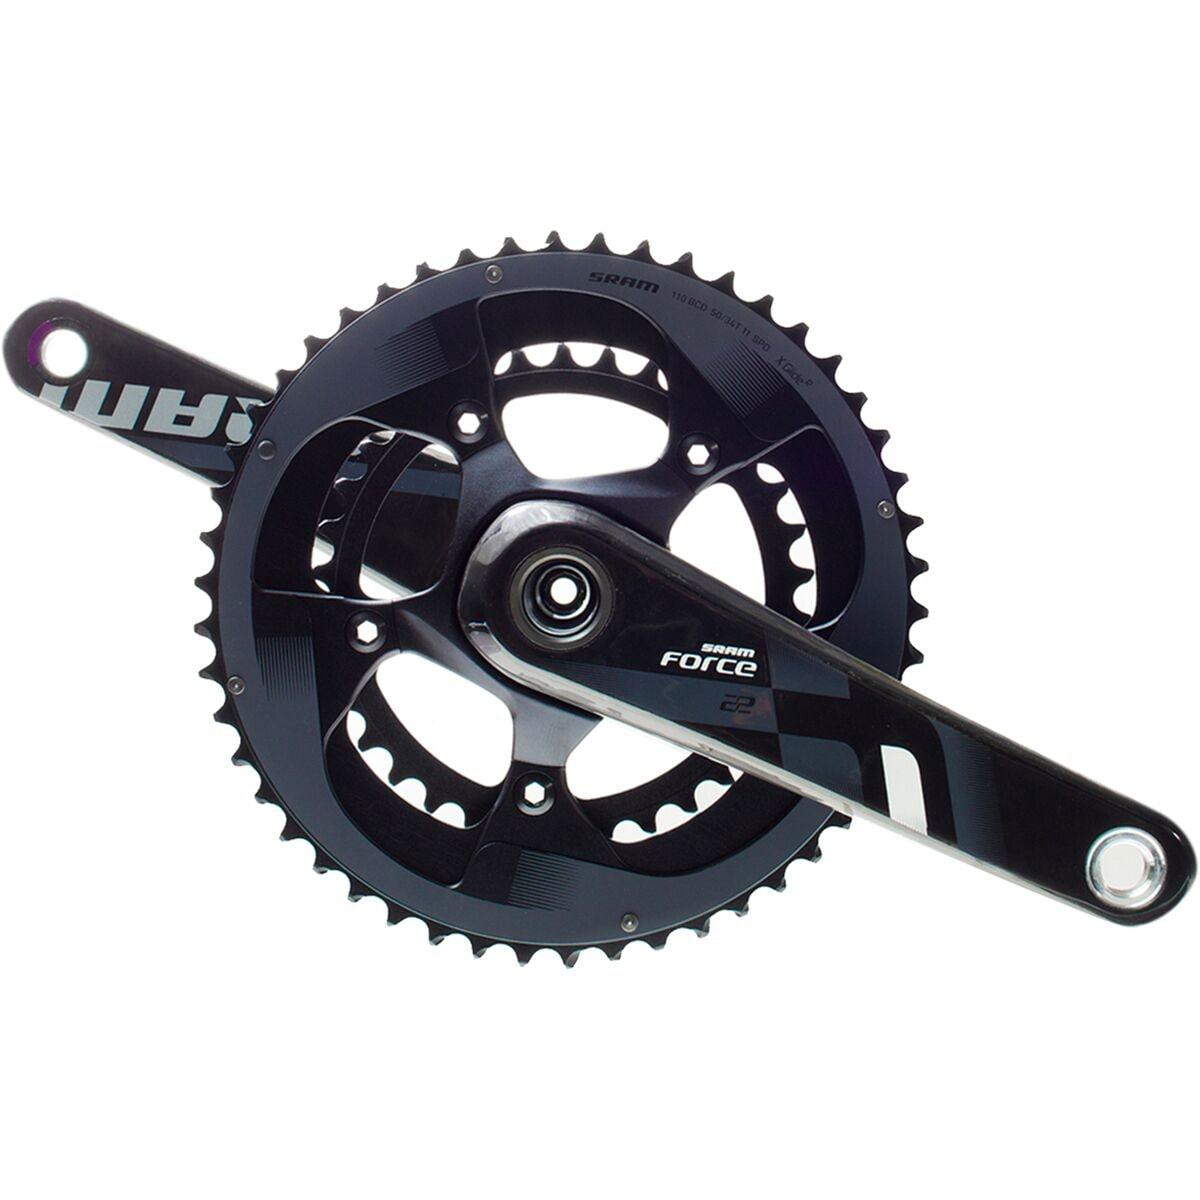 SRAM Force 22 GXP Crankset | Competitive Cyclist